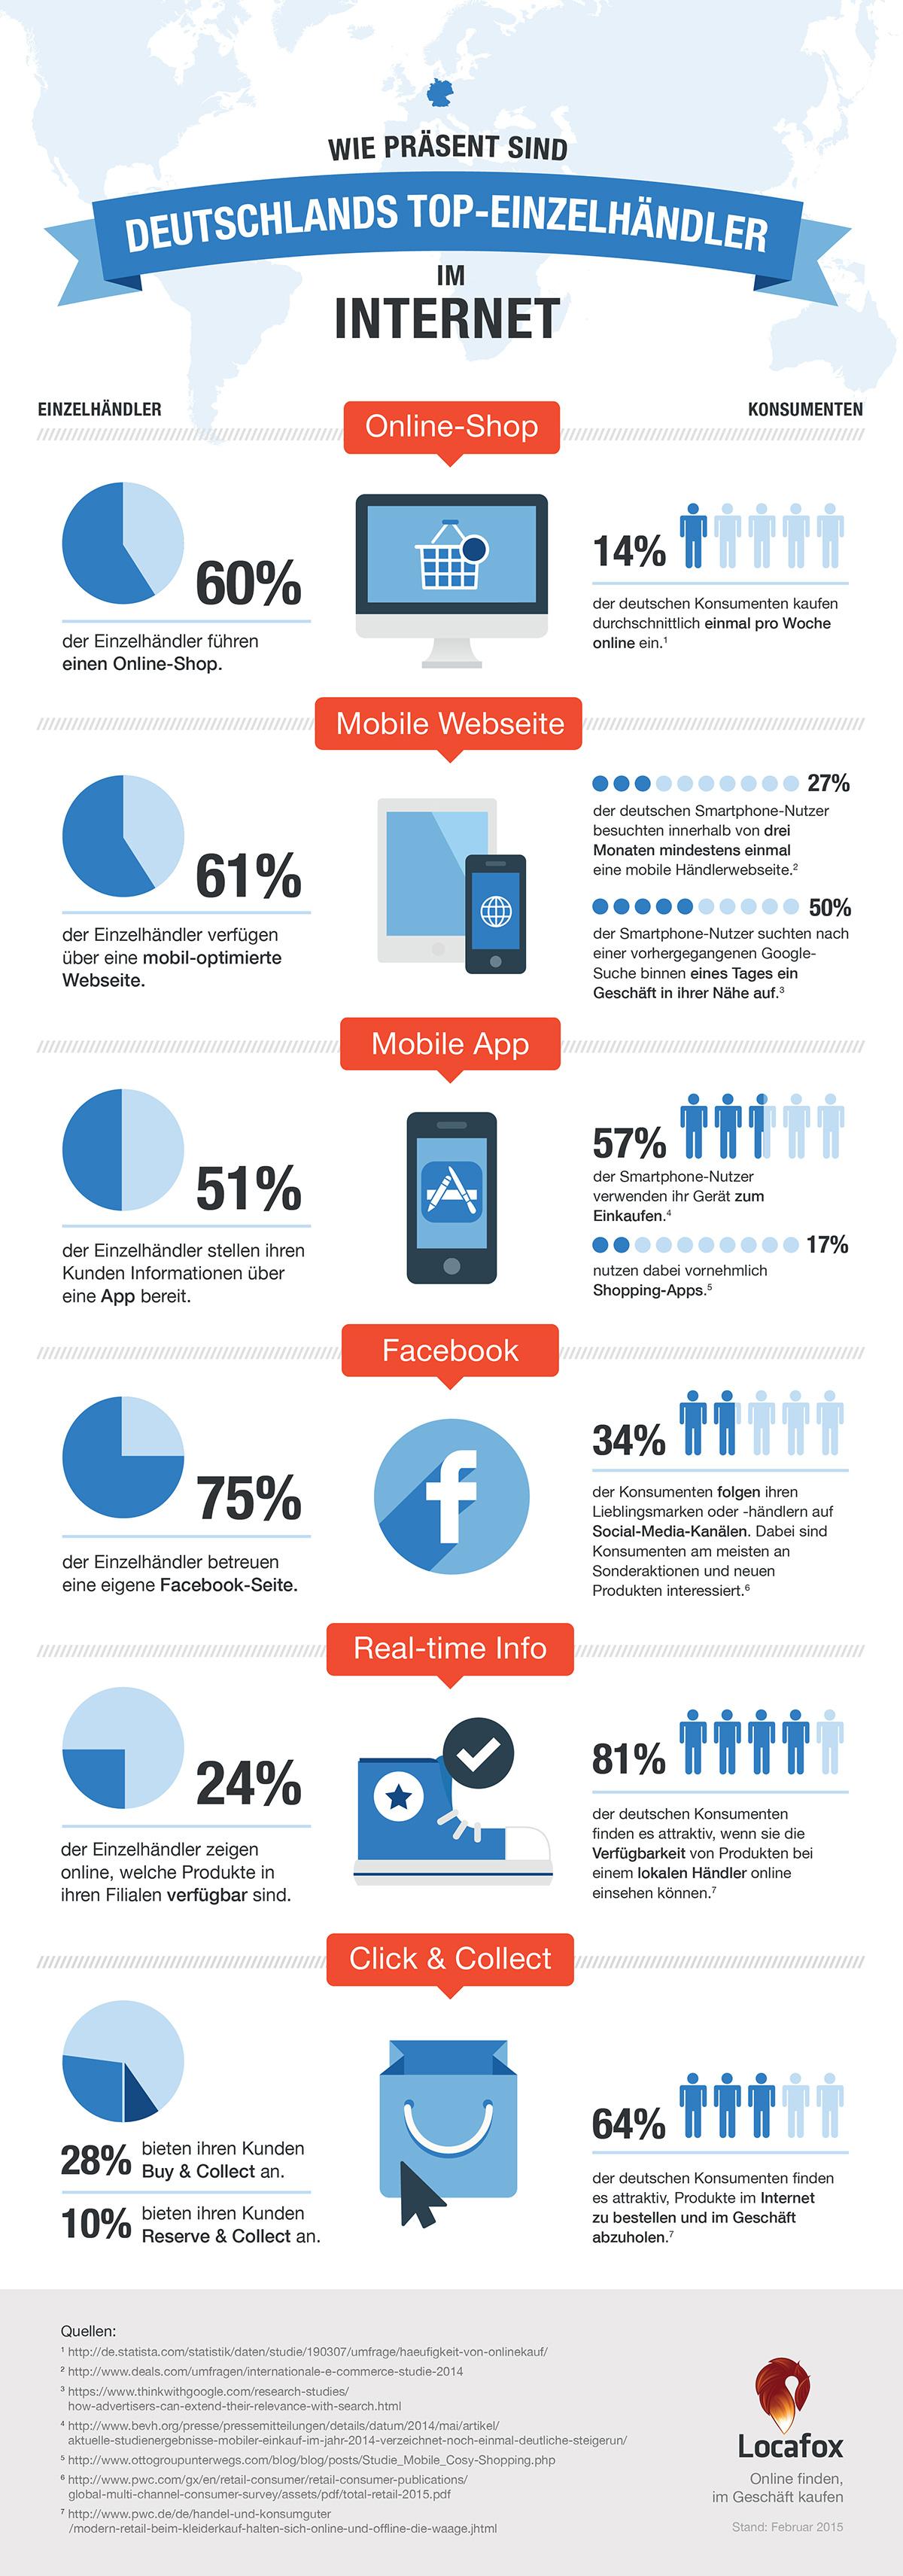 Einzelhaendler_im_Internet_Infografik